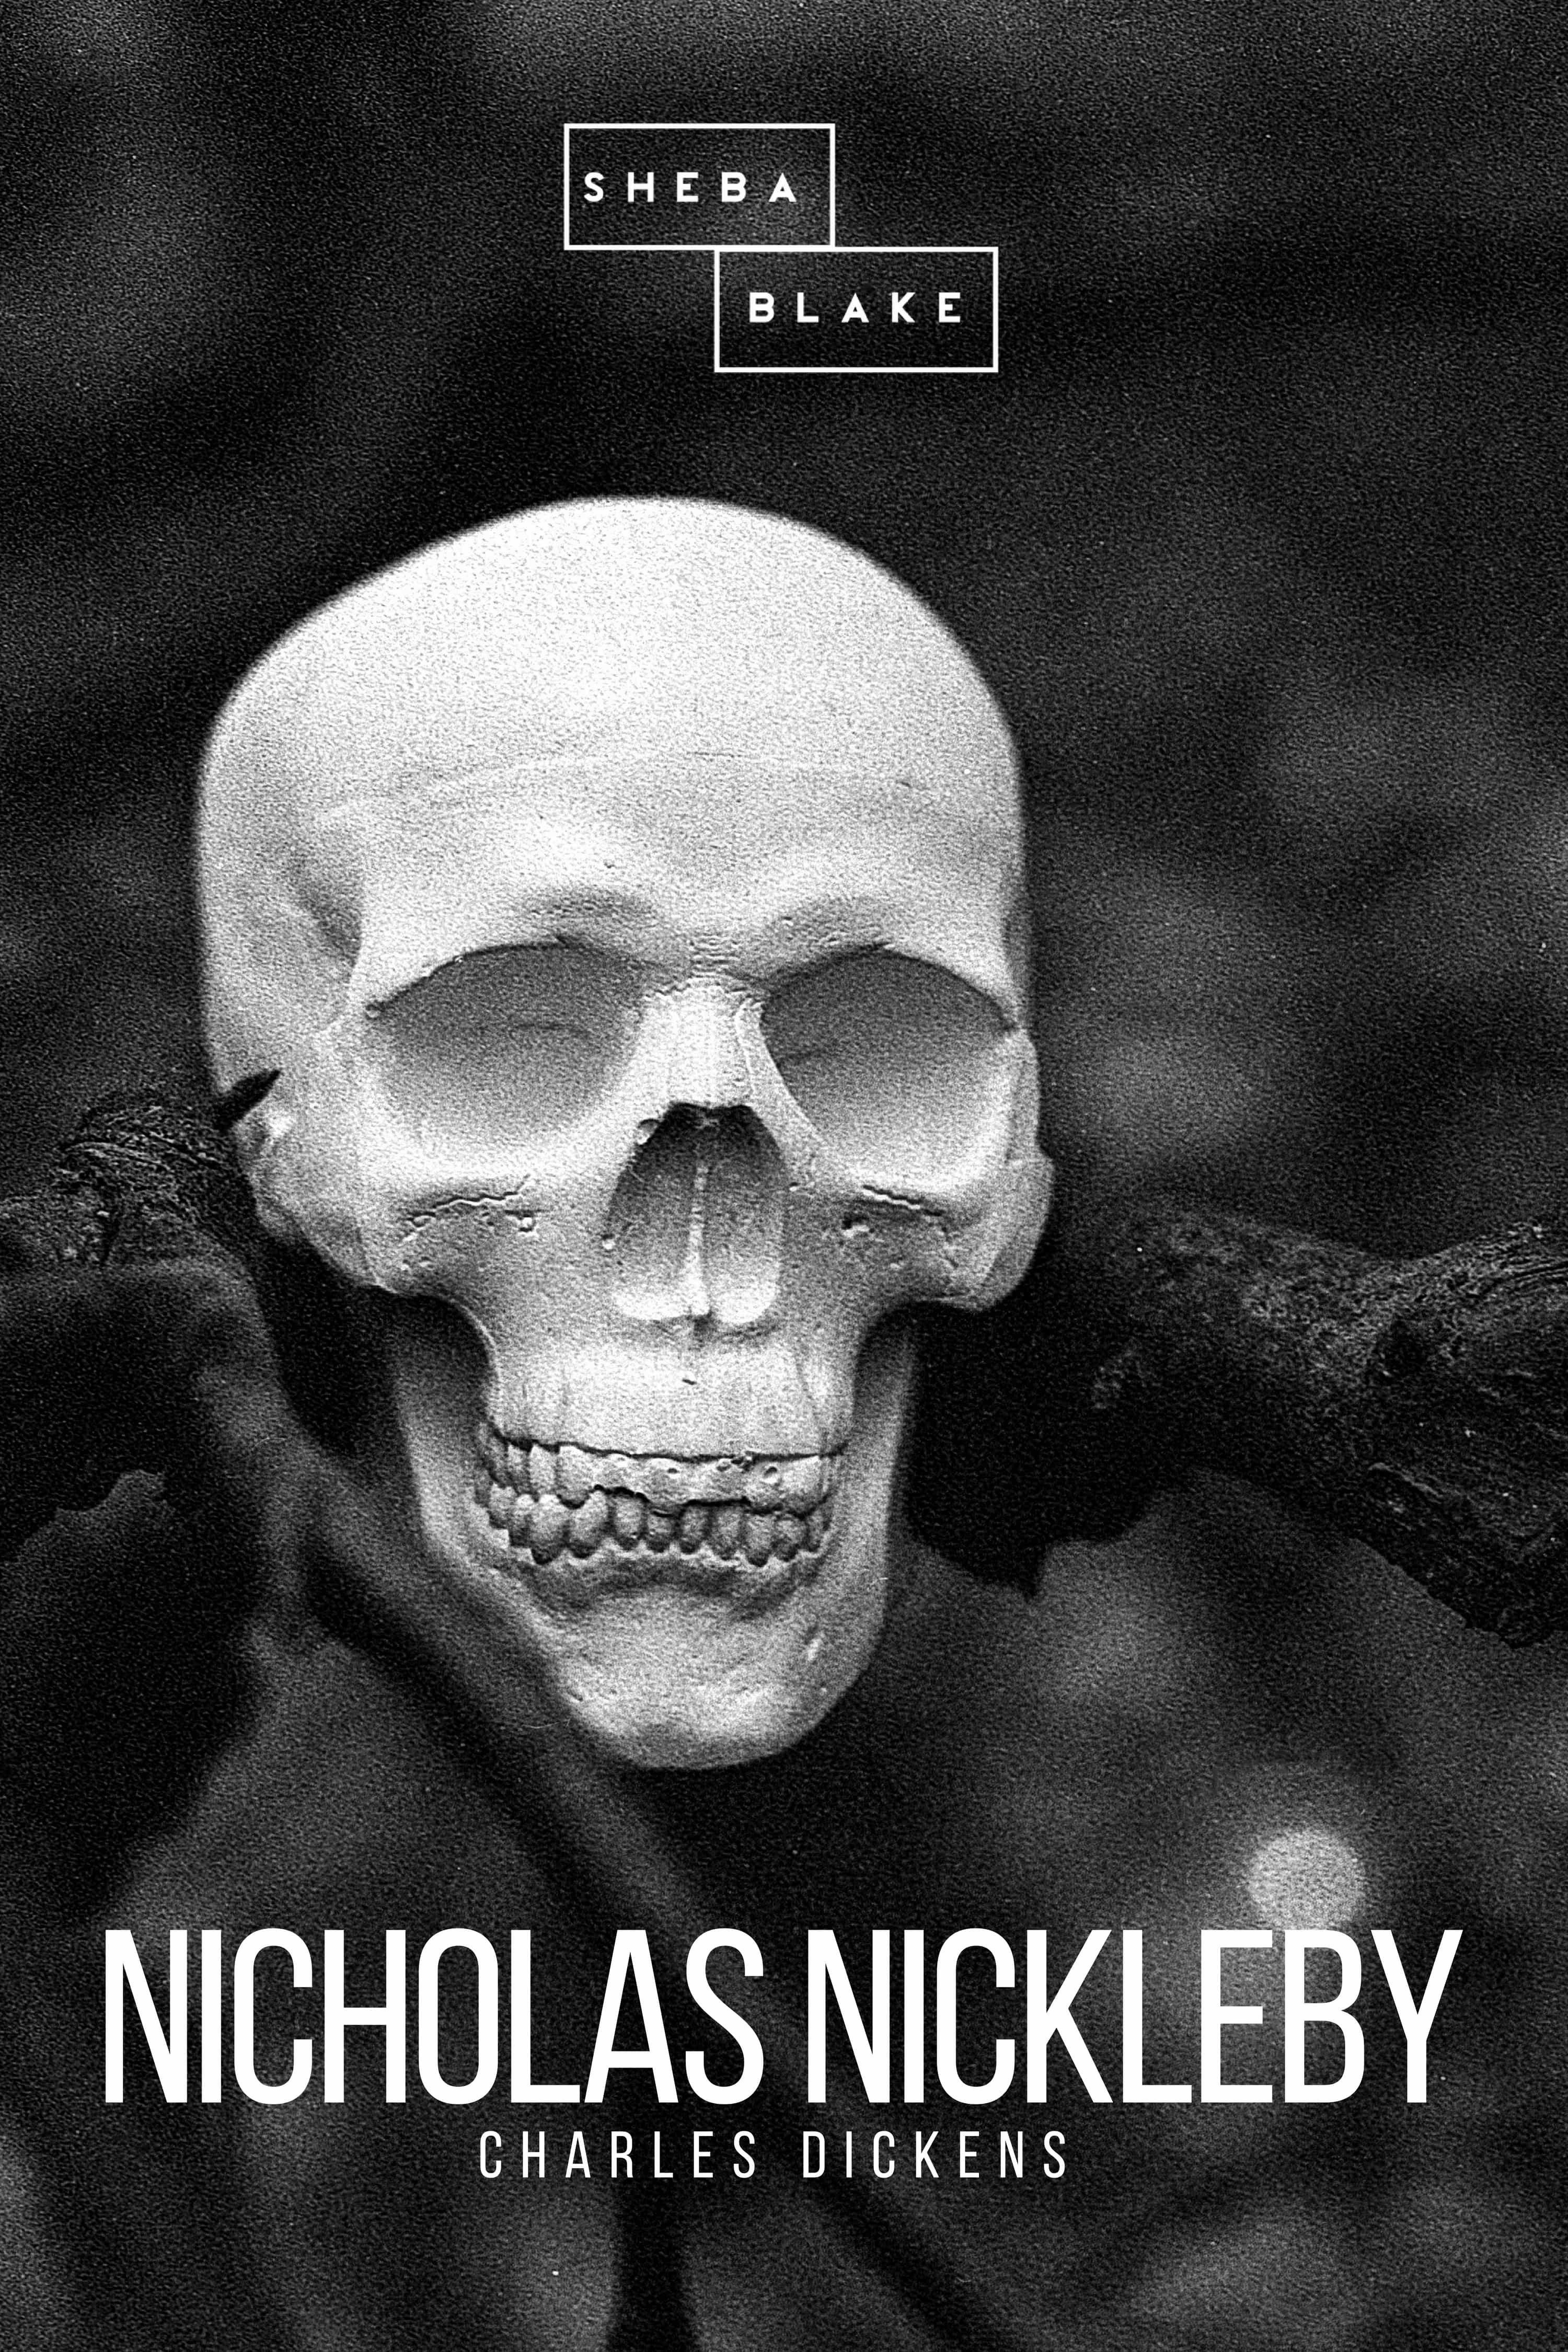 Nicholas Nickleby   por Dickens Charles epub